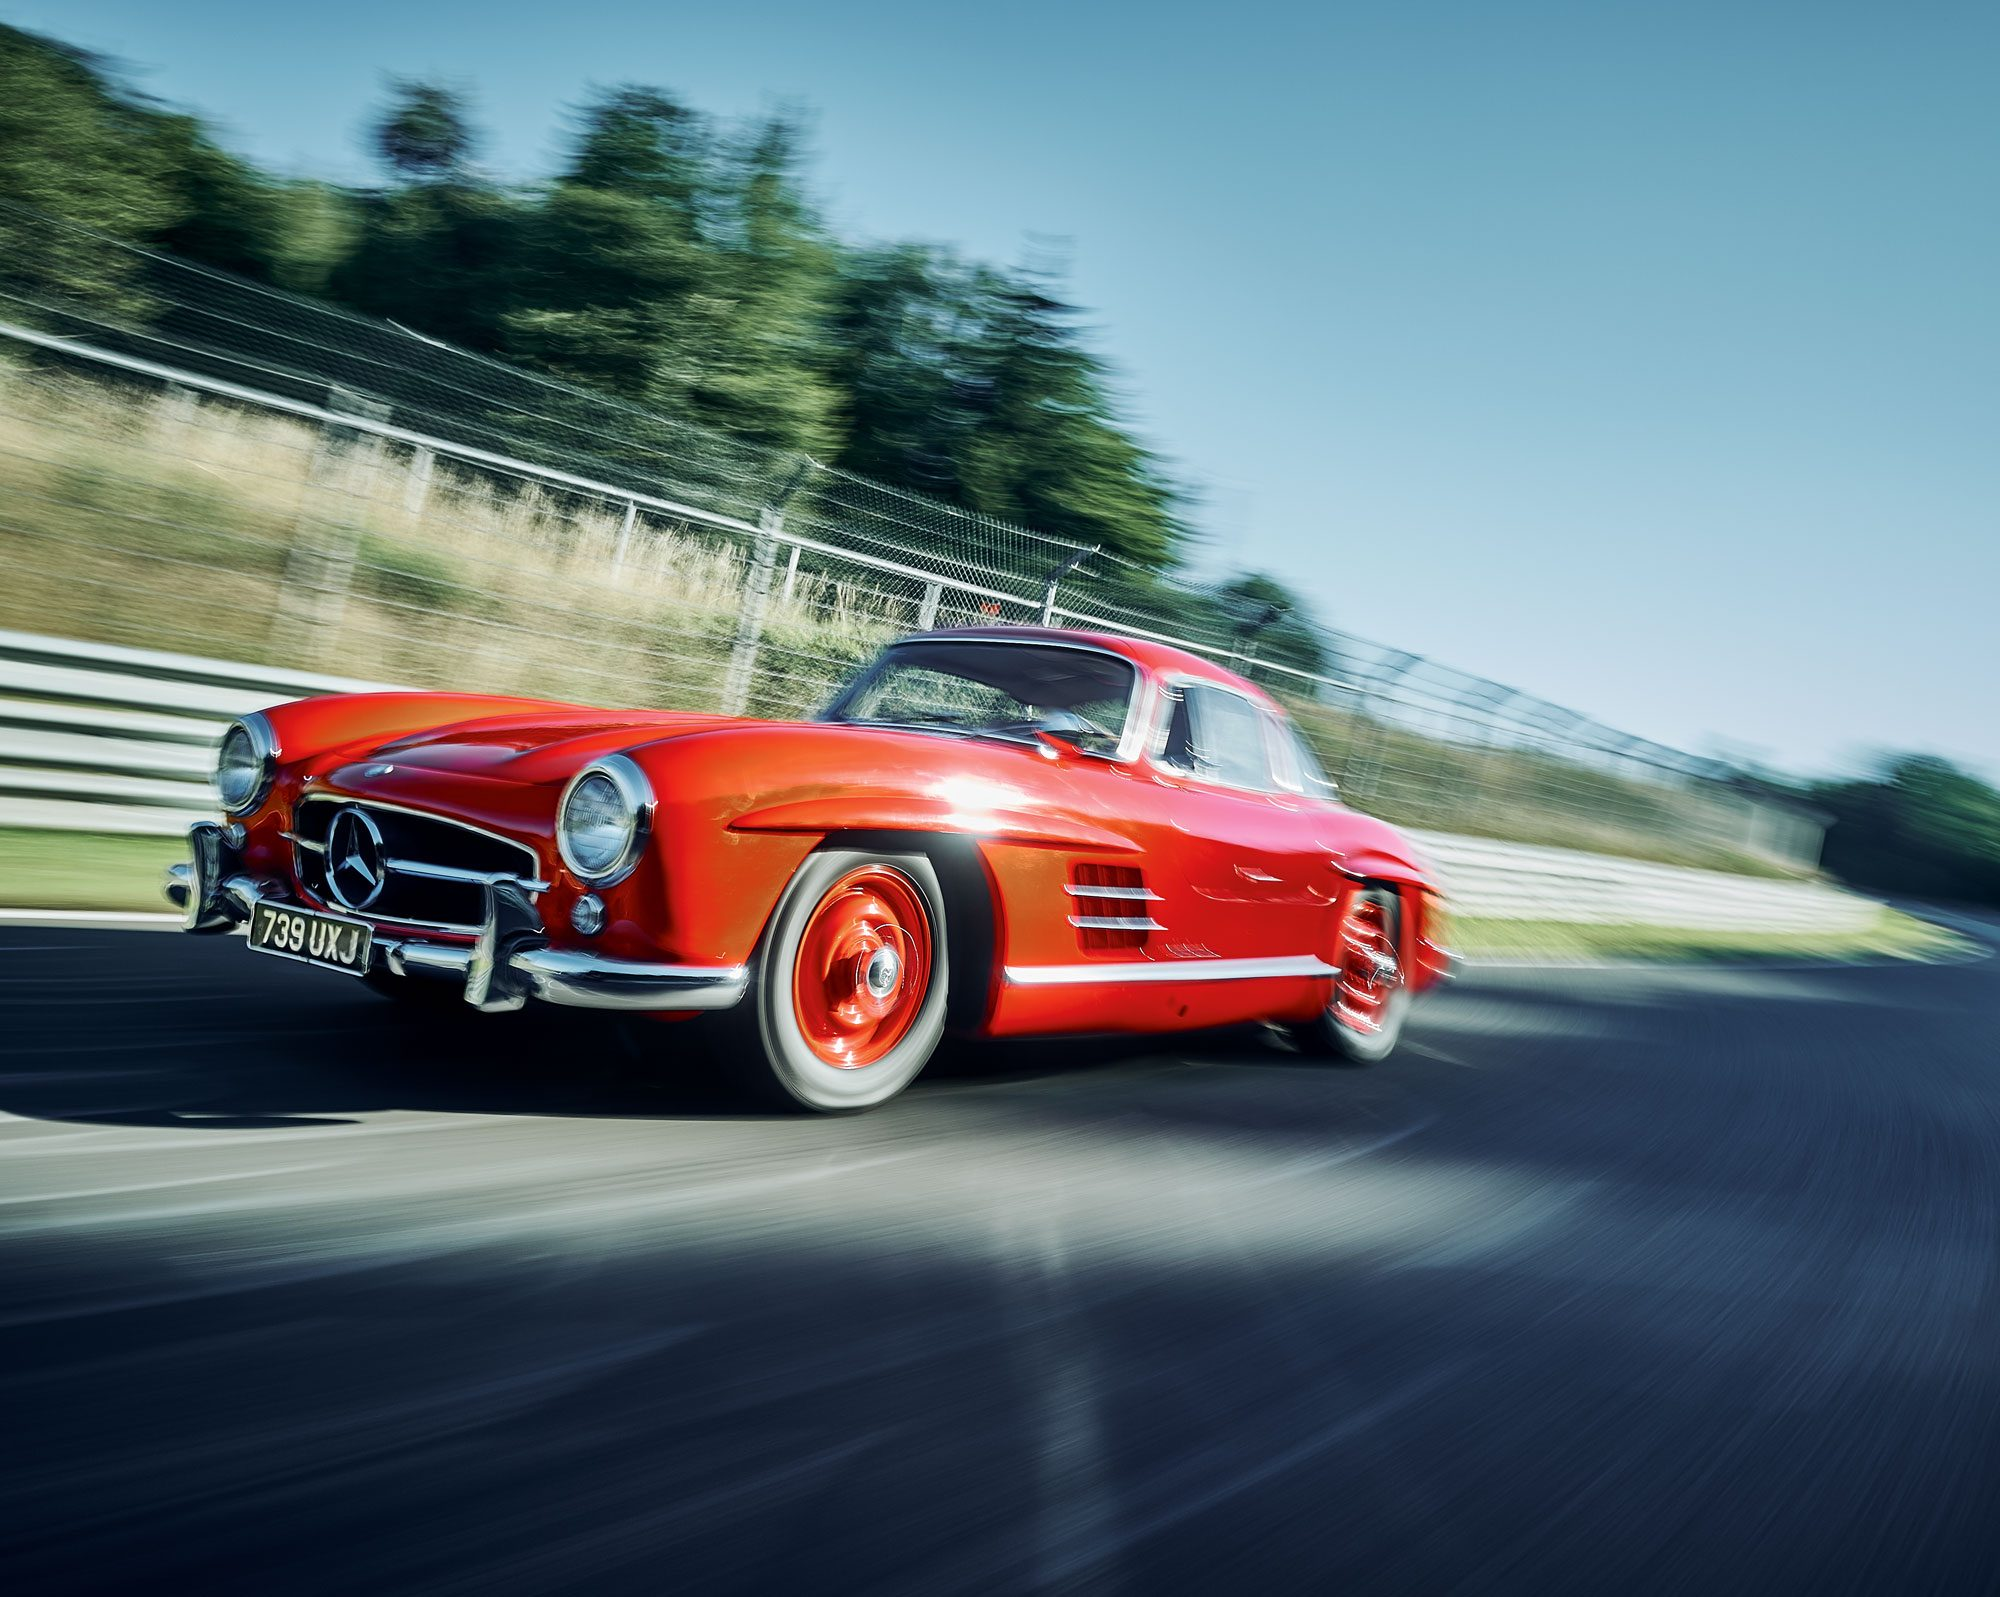 #20, Mercedes-Benz, 300SL, W198, Nürburgring, Gunther Thiel